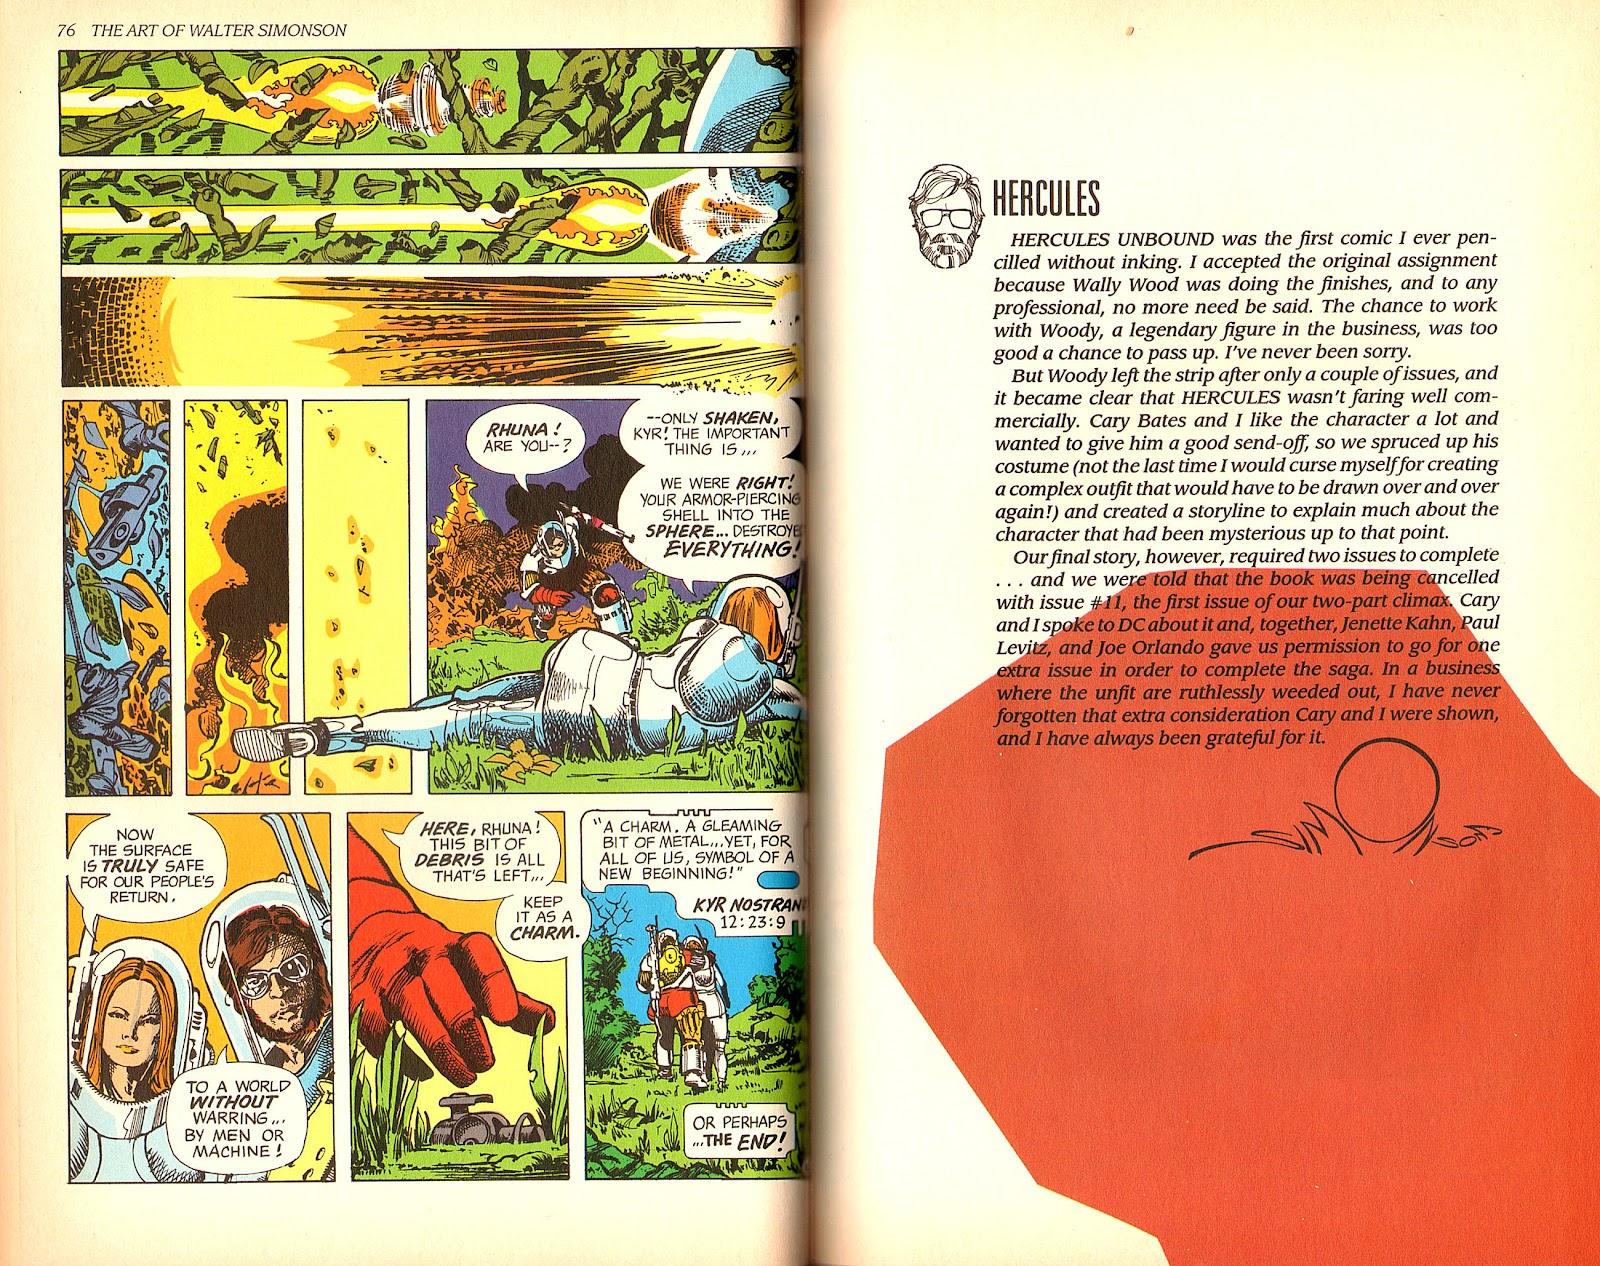 Read online The Art of Walter Simonson comic -  Issue # TPB - 40